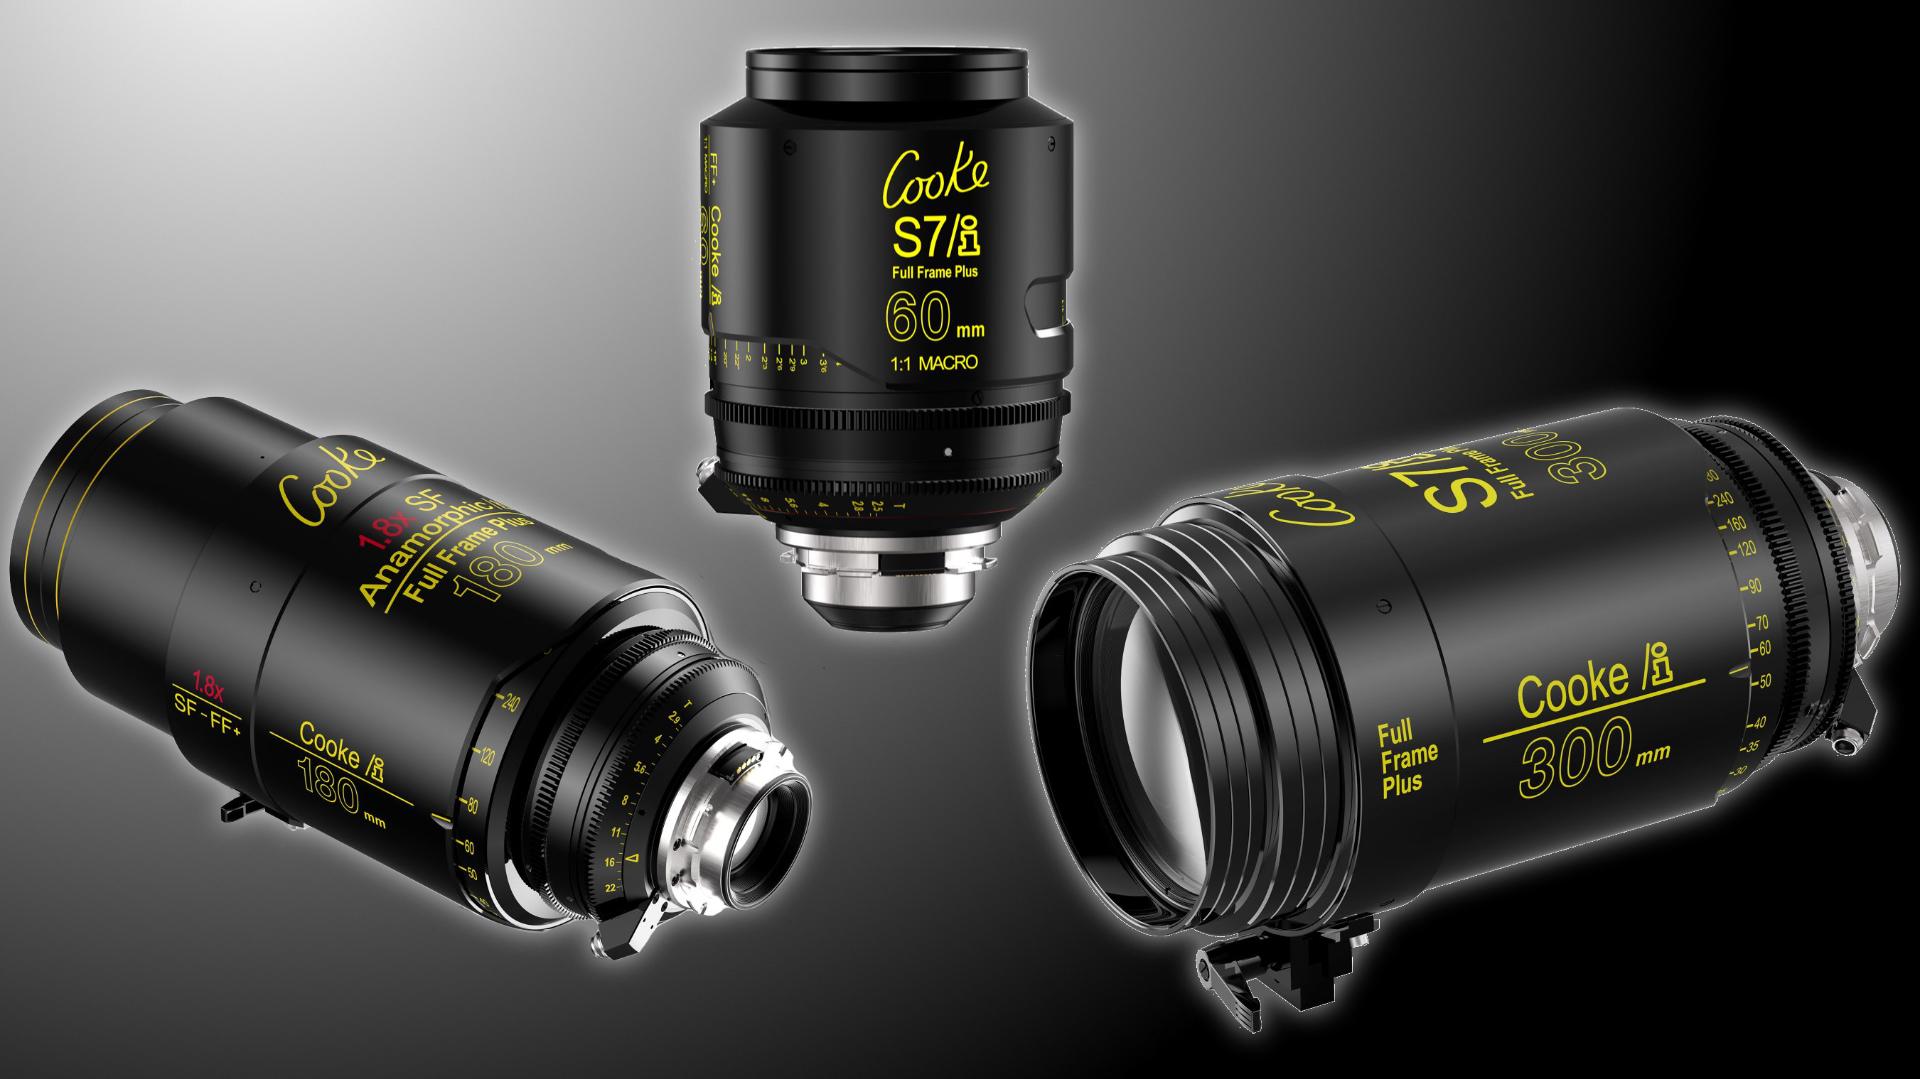 Presentan cinco nuevos lentes Full Frame Cooke Plus S7/i y Anamorphic/i